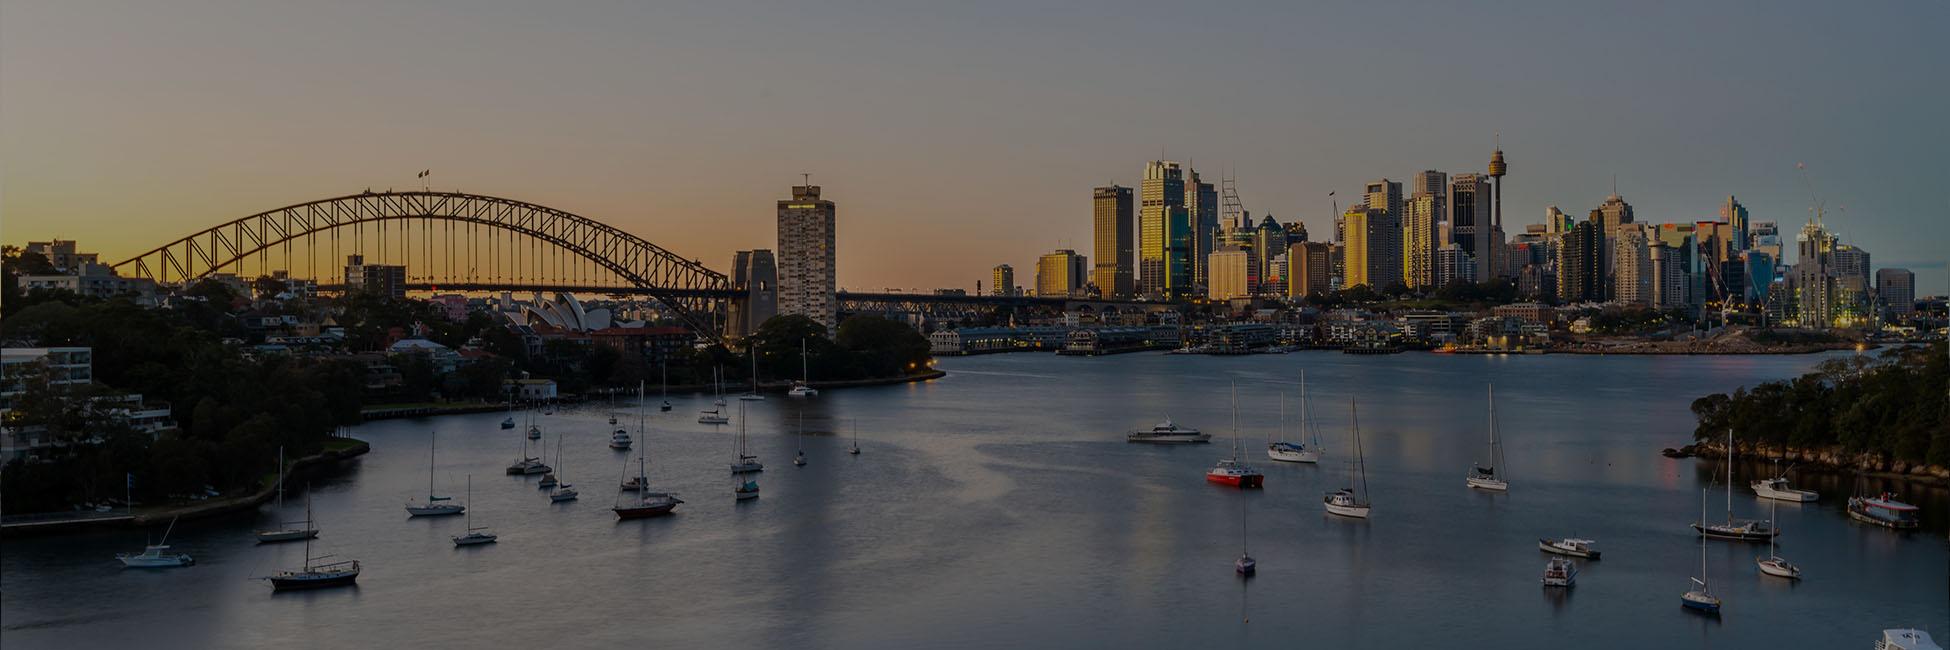 Agenda | Grow with HubSpot Sydney 2017